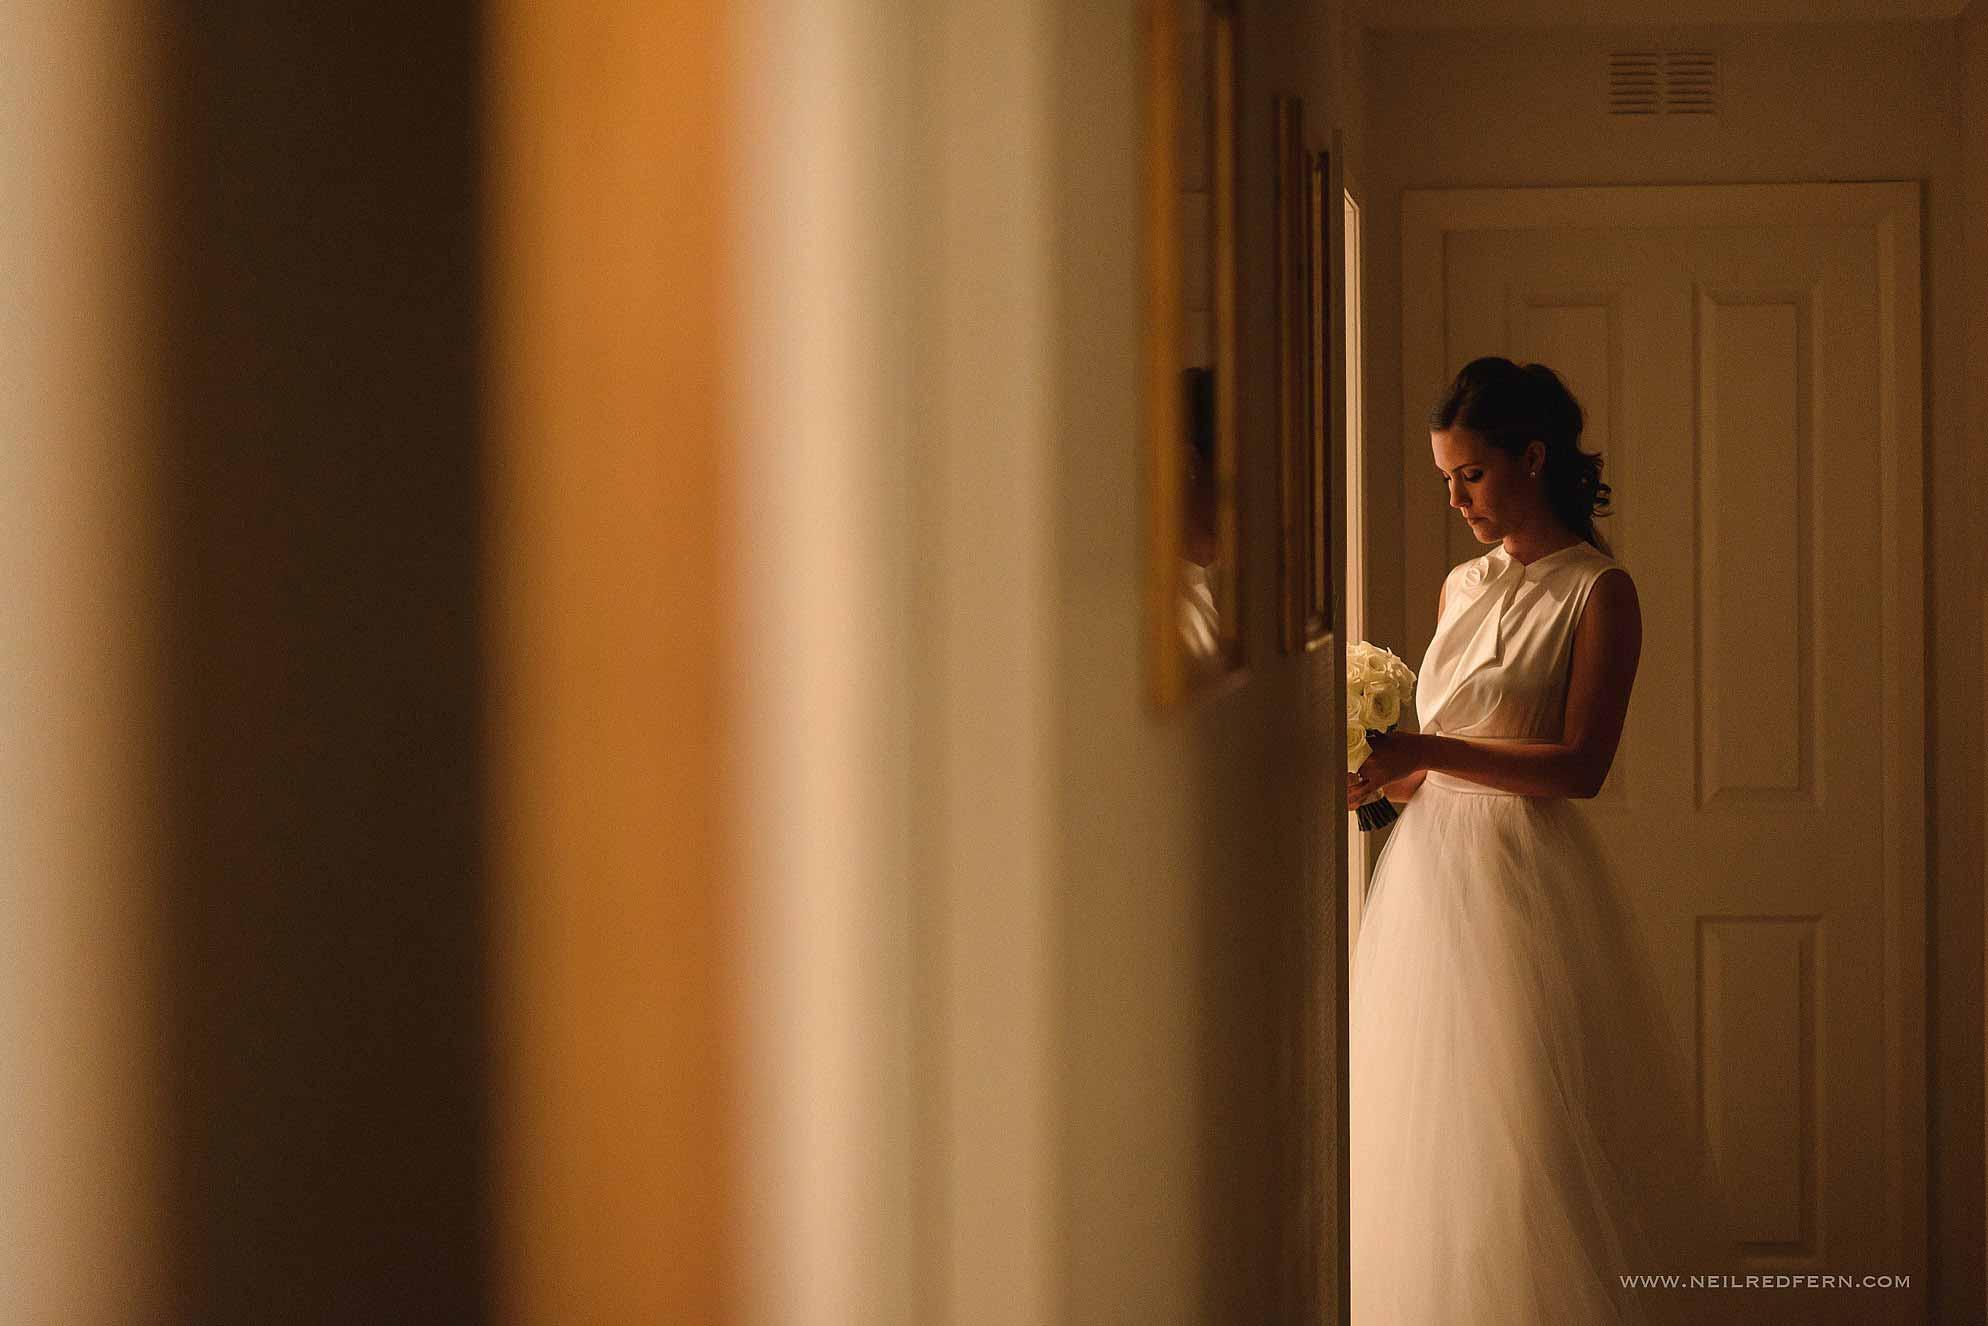 st-andrews-wedding-photograph-05